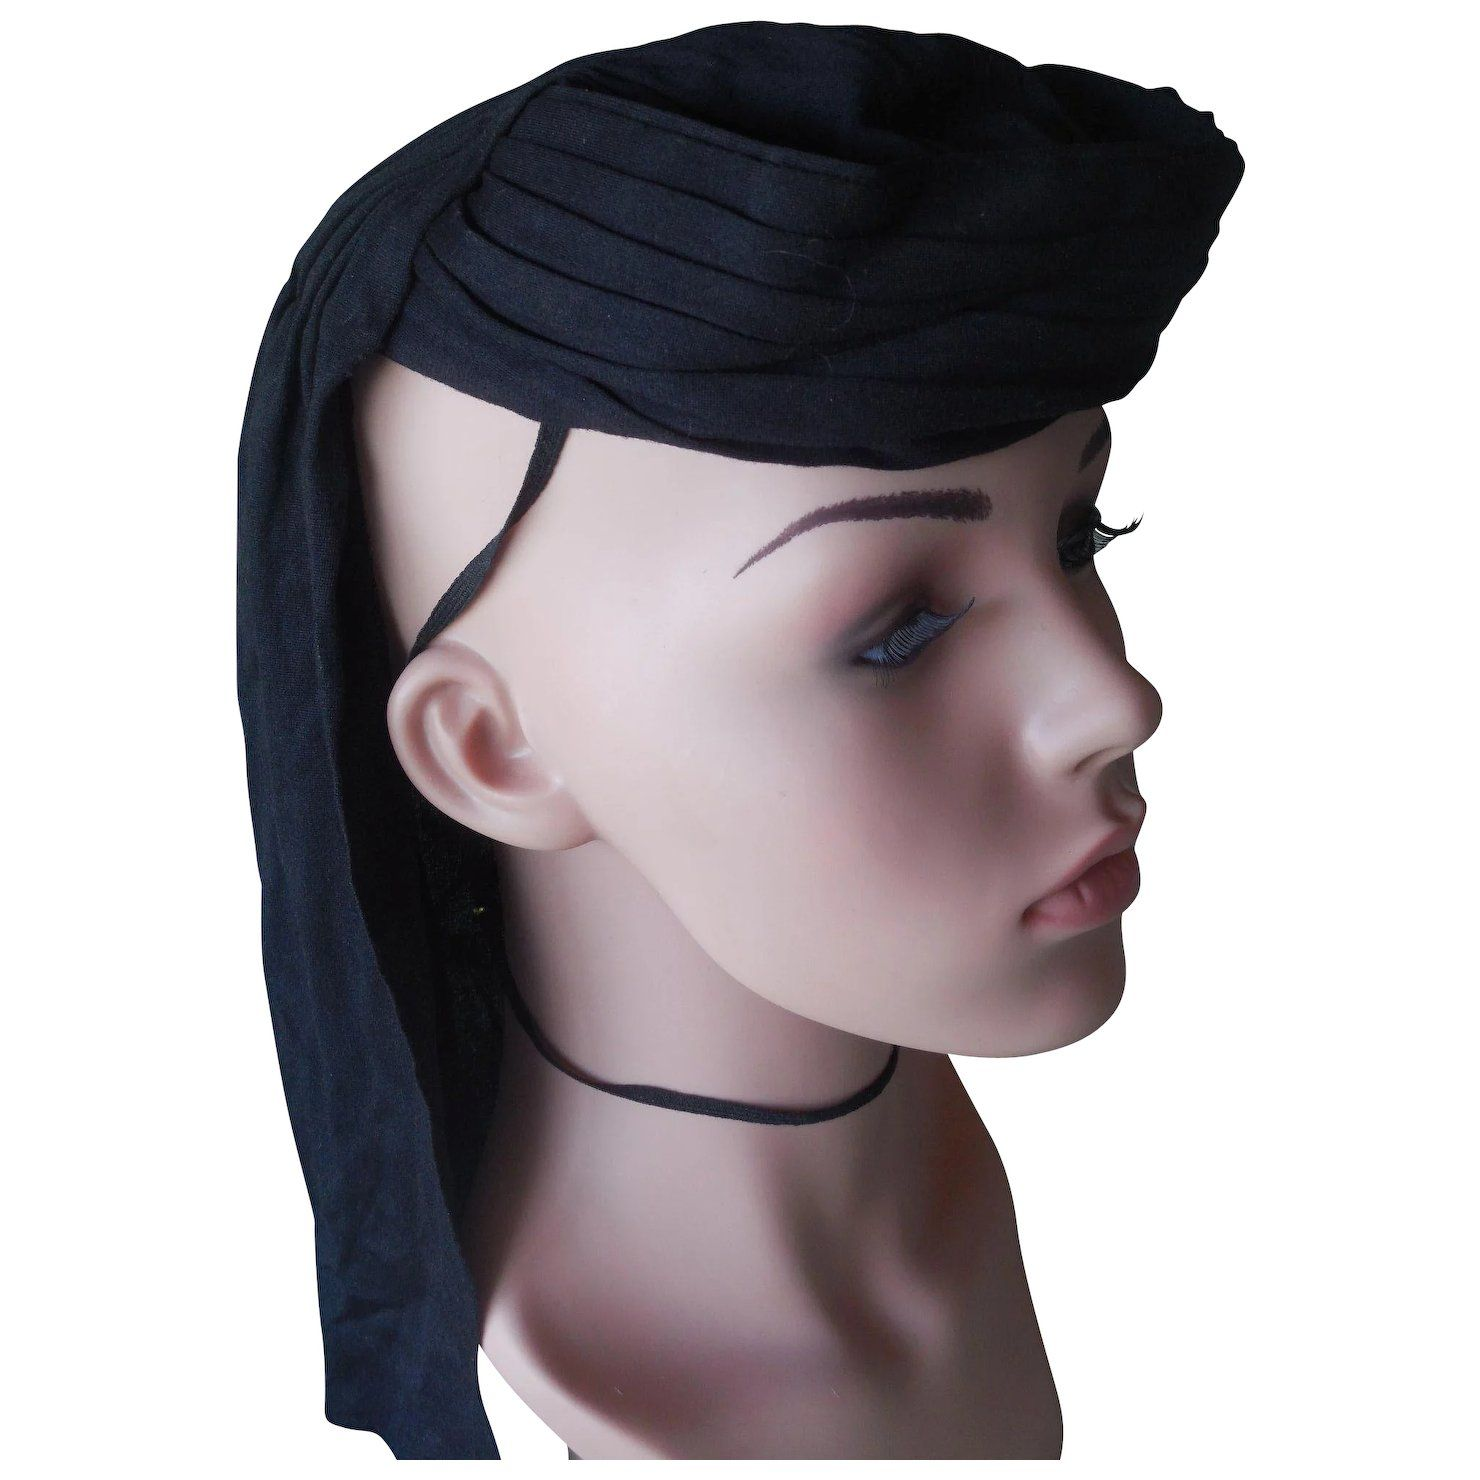 Vintage 1920's Black Silk Eqyptian Style Hat Hat fashion